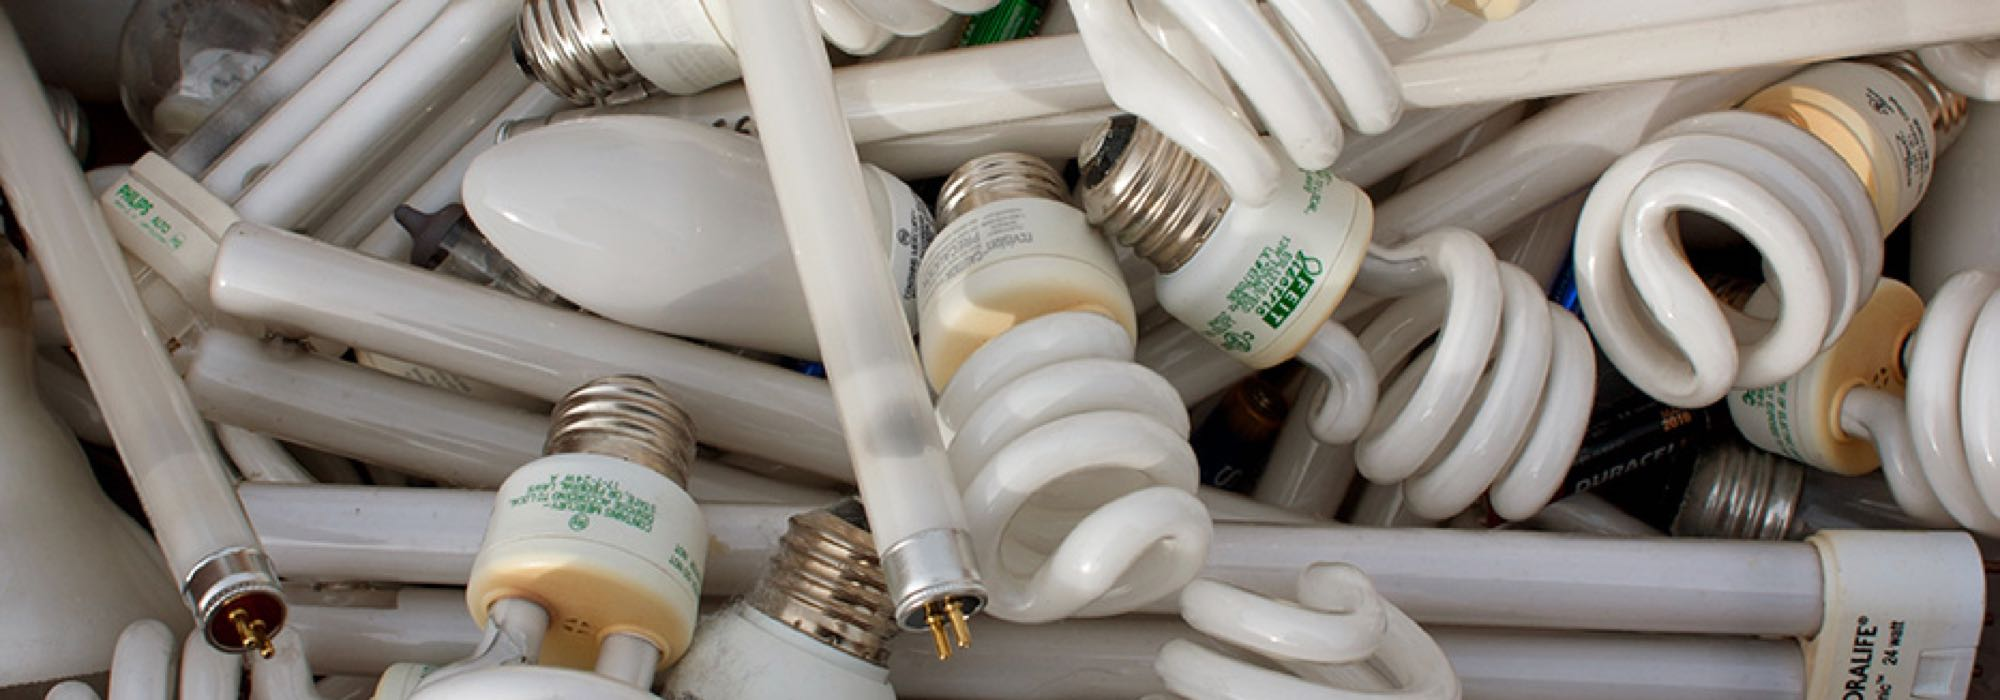 light recycling